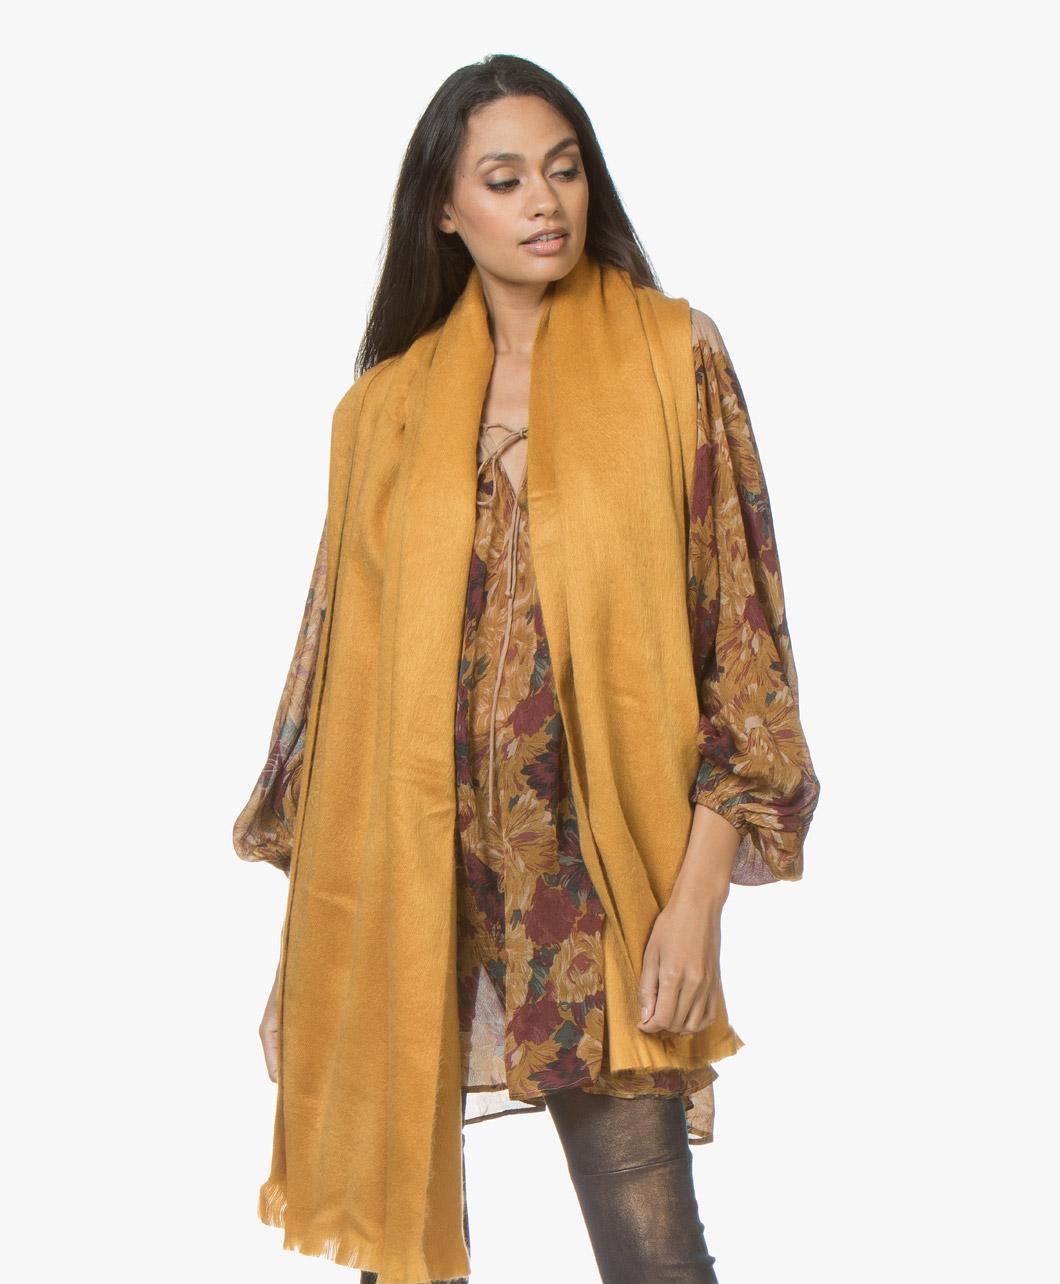 Obrázek Alpaca Loca Scarf Ochre Yellow Handmade Uni